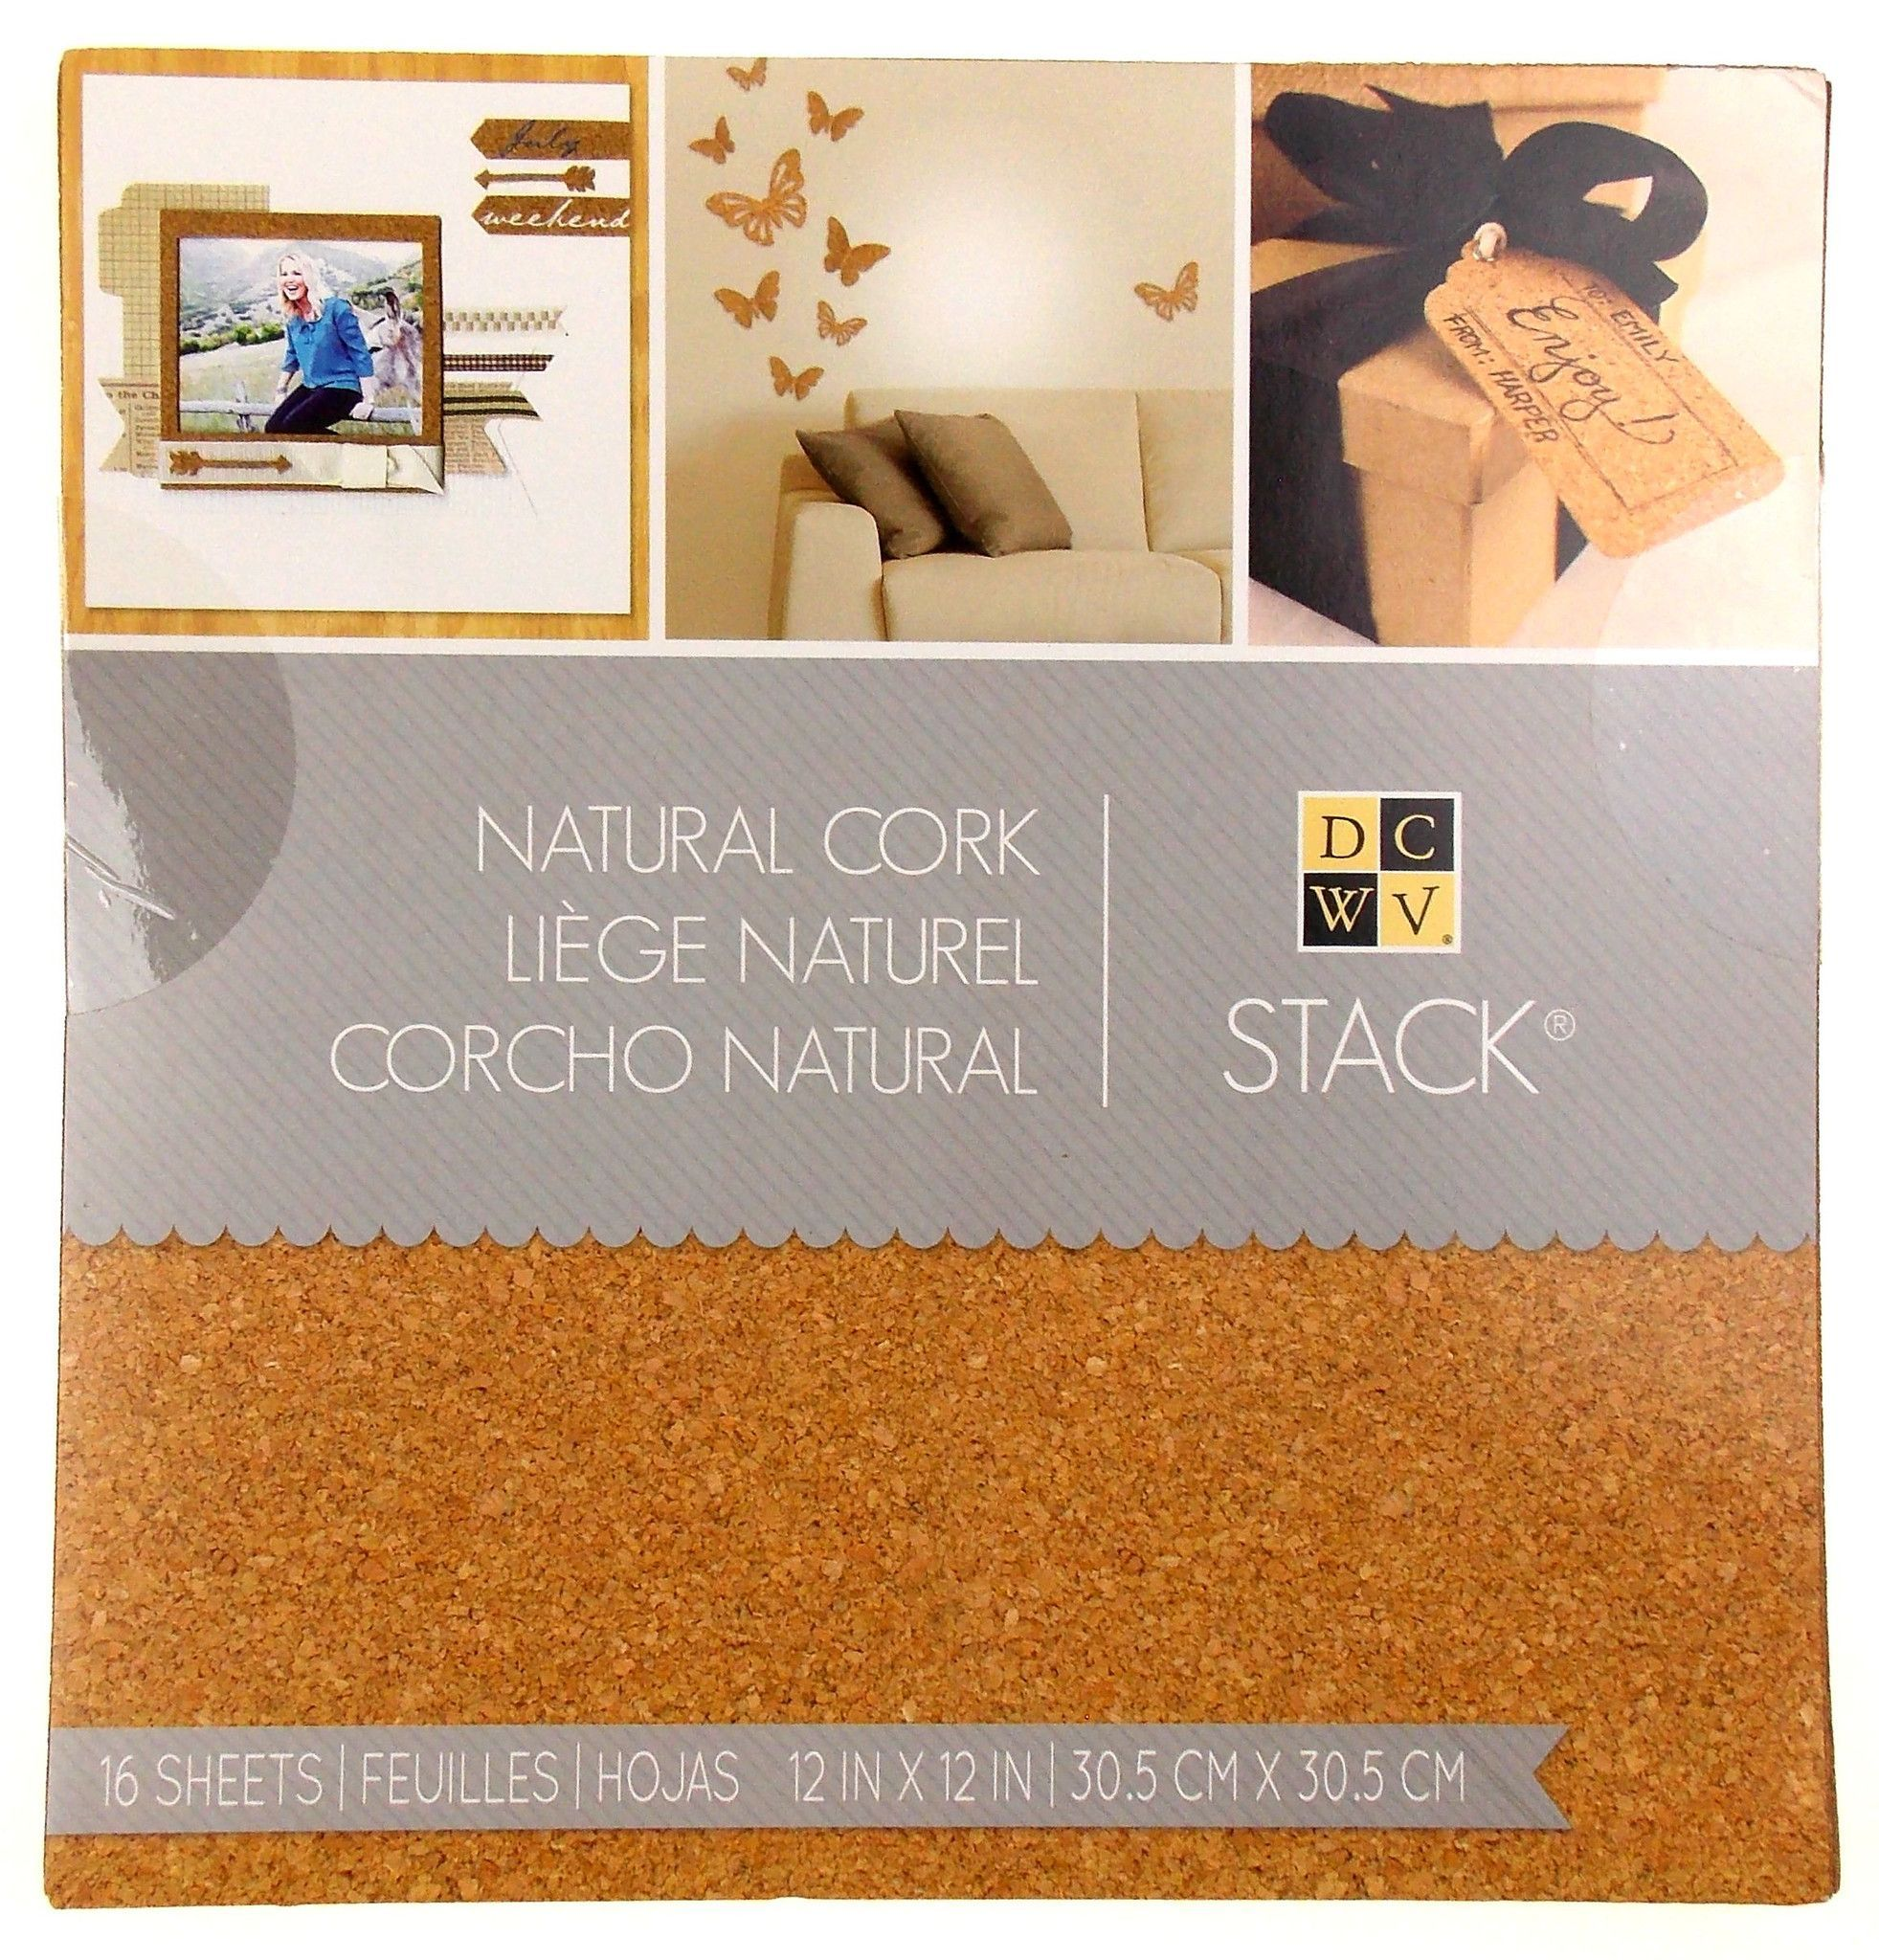 bridal shower invitation ideas craft%0A Stack Natural Cork Book    Sheets     x     Crafts DCWV Wedding Invitations  Favors